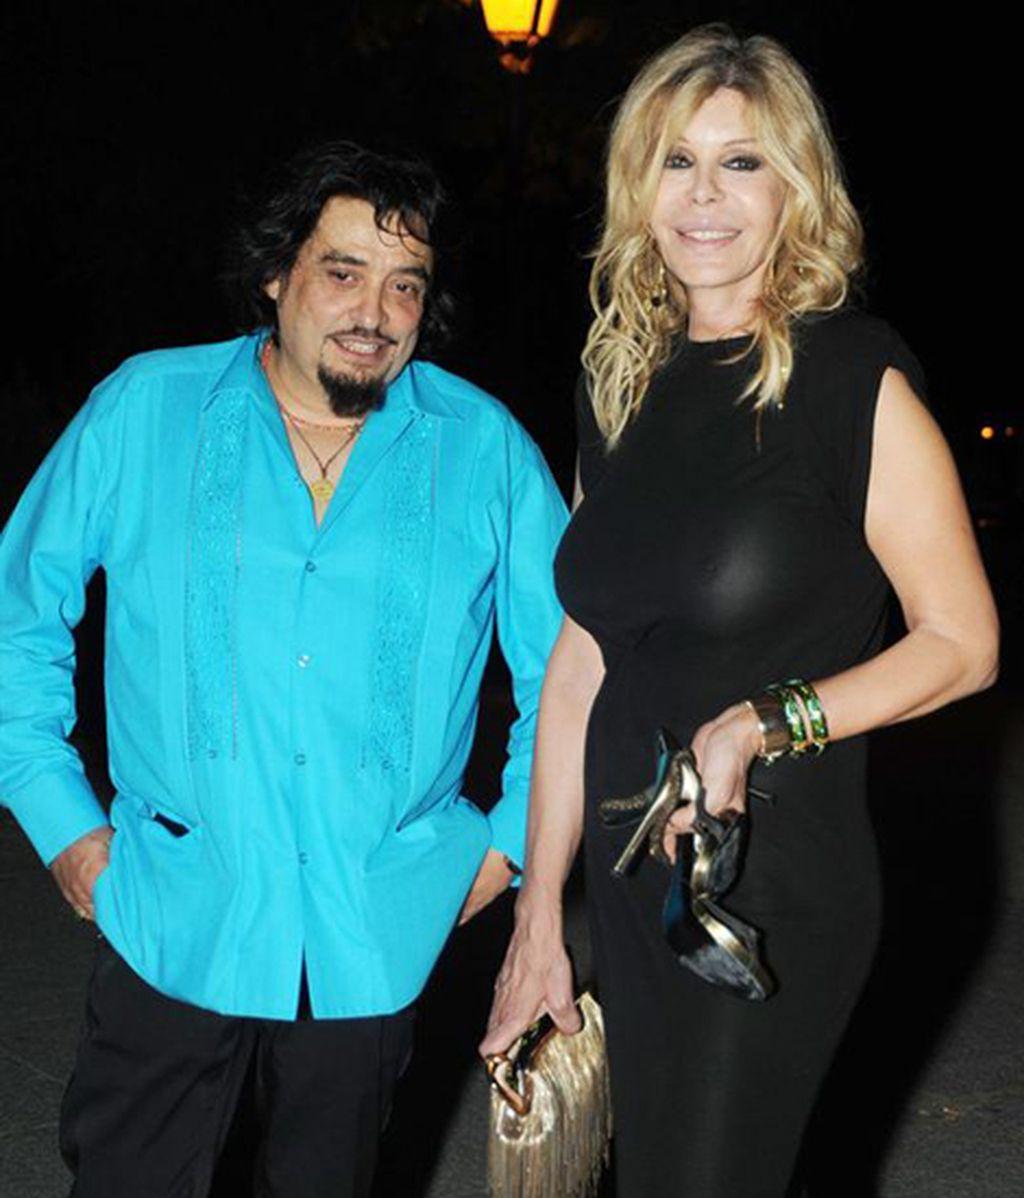 Miguel Ángel Arenas 'Capi' y Bibiana Fernández